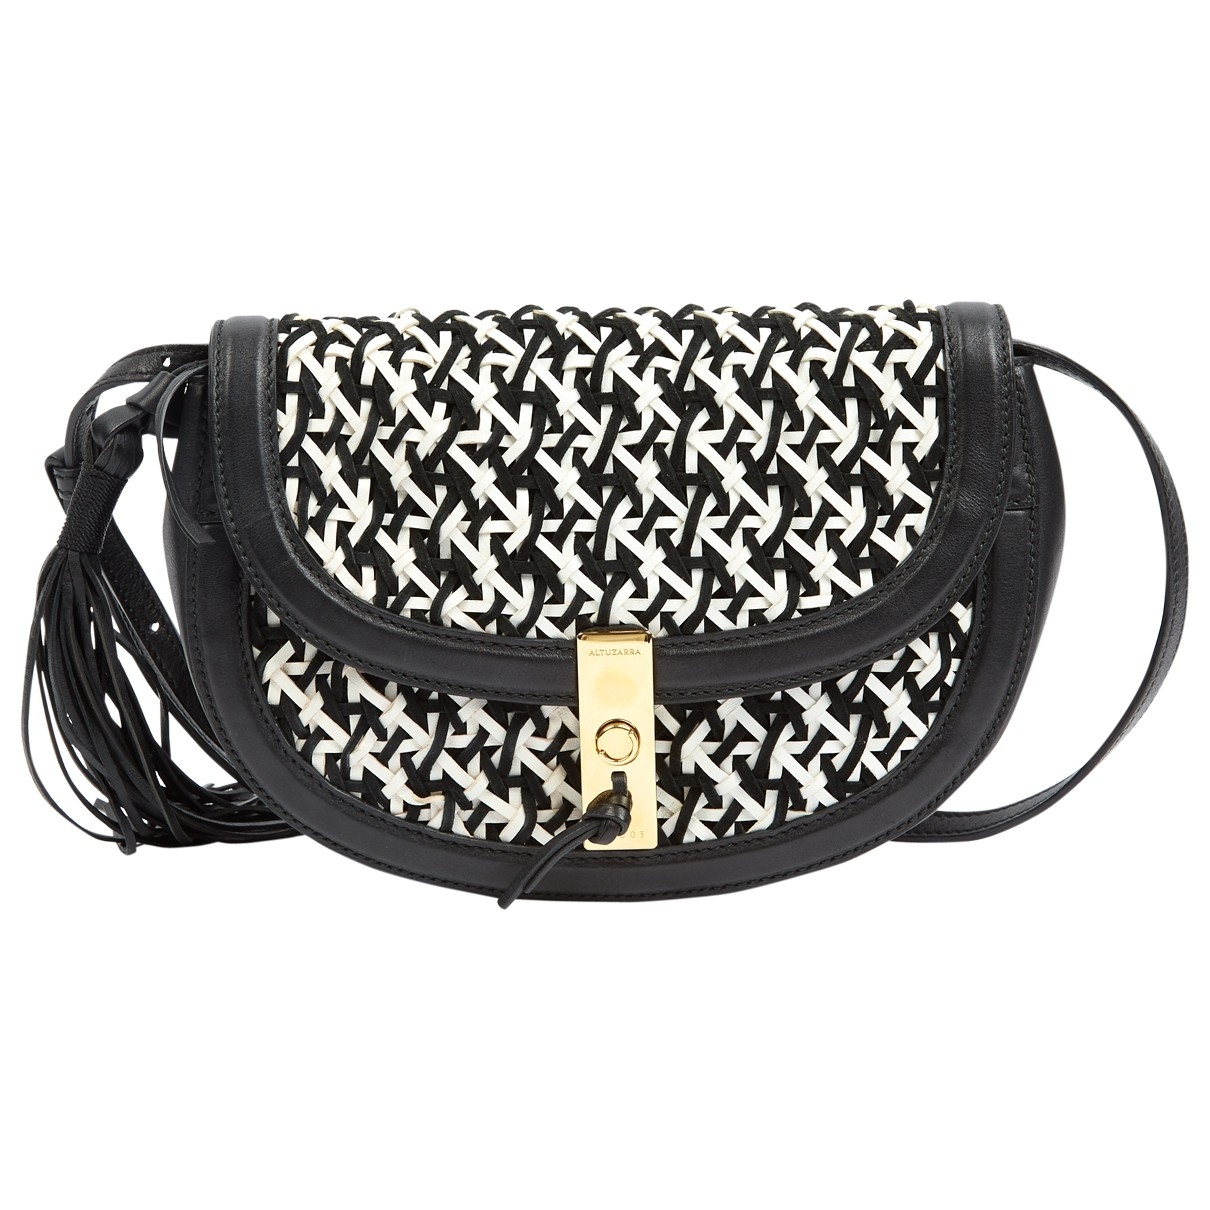 Altuzarra \N Black Leather handbag for Women \N